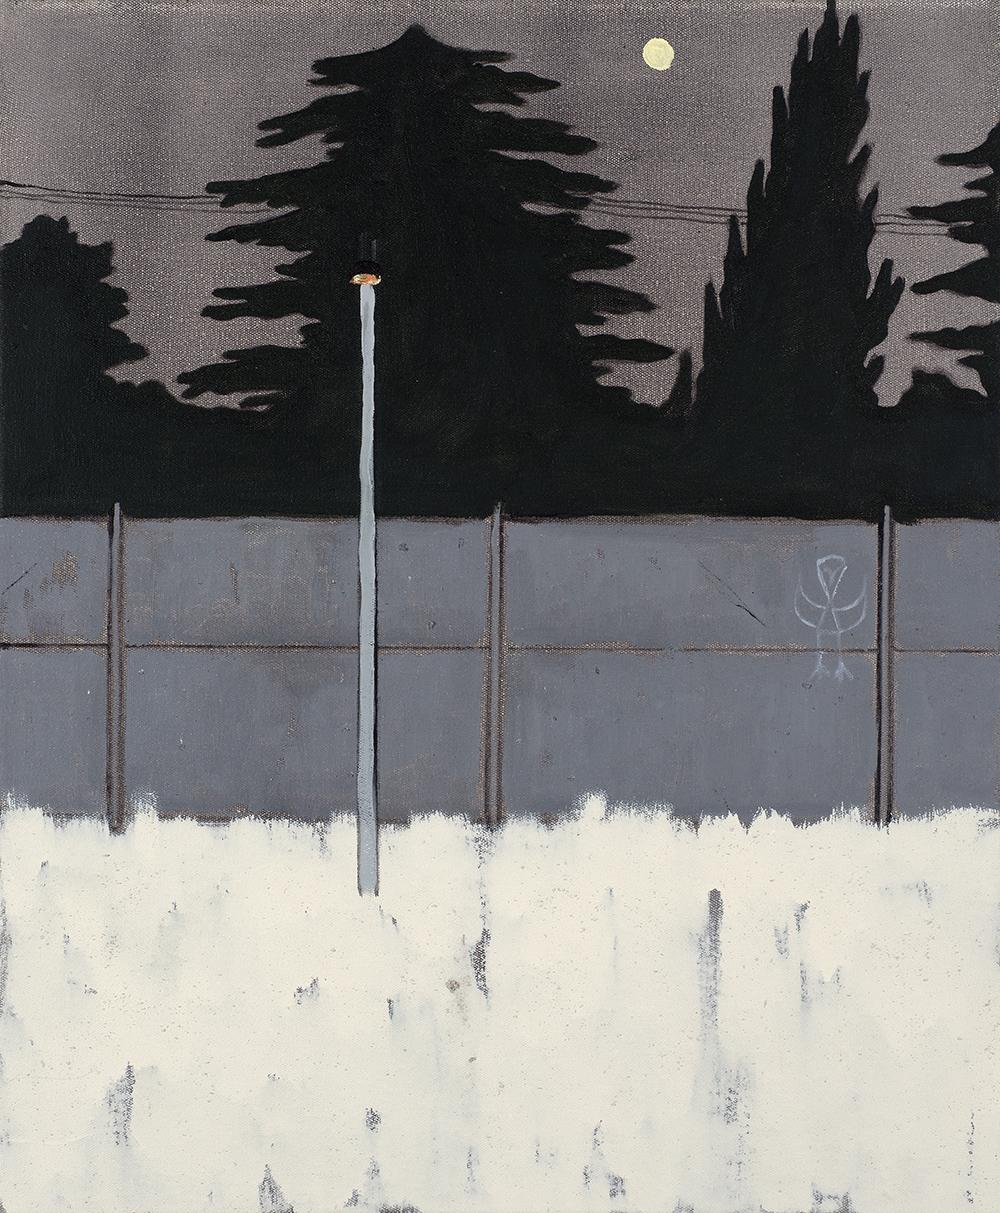 Francisco Rodriguez.<em> Street at night</em>, 2019. Oil on canvas, 23 5/8 x 19 5/8 inches (60 x 50 cm)